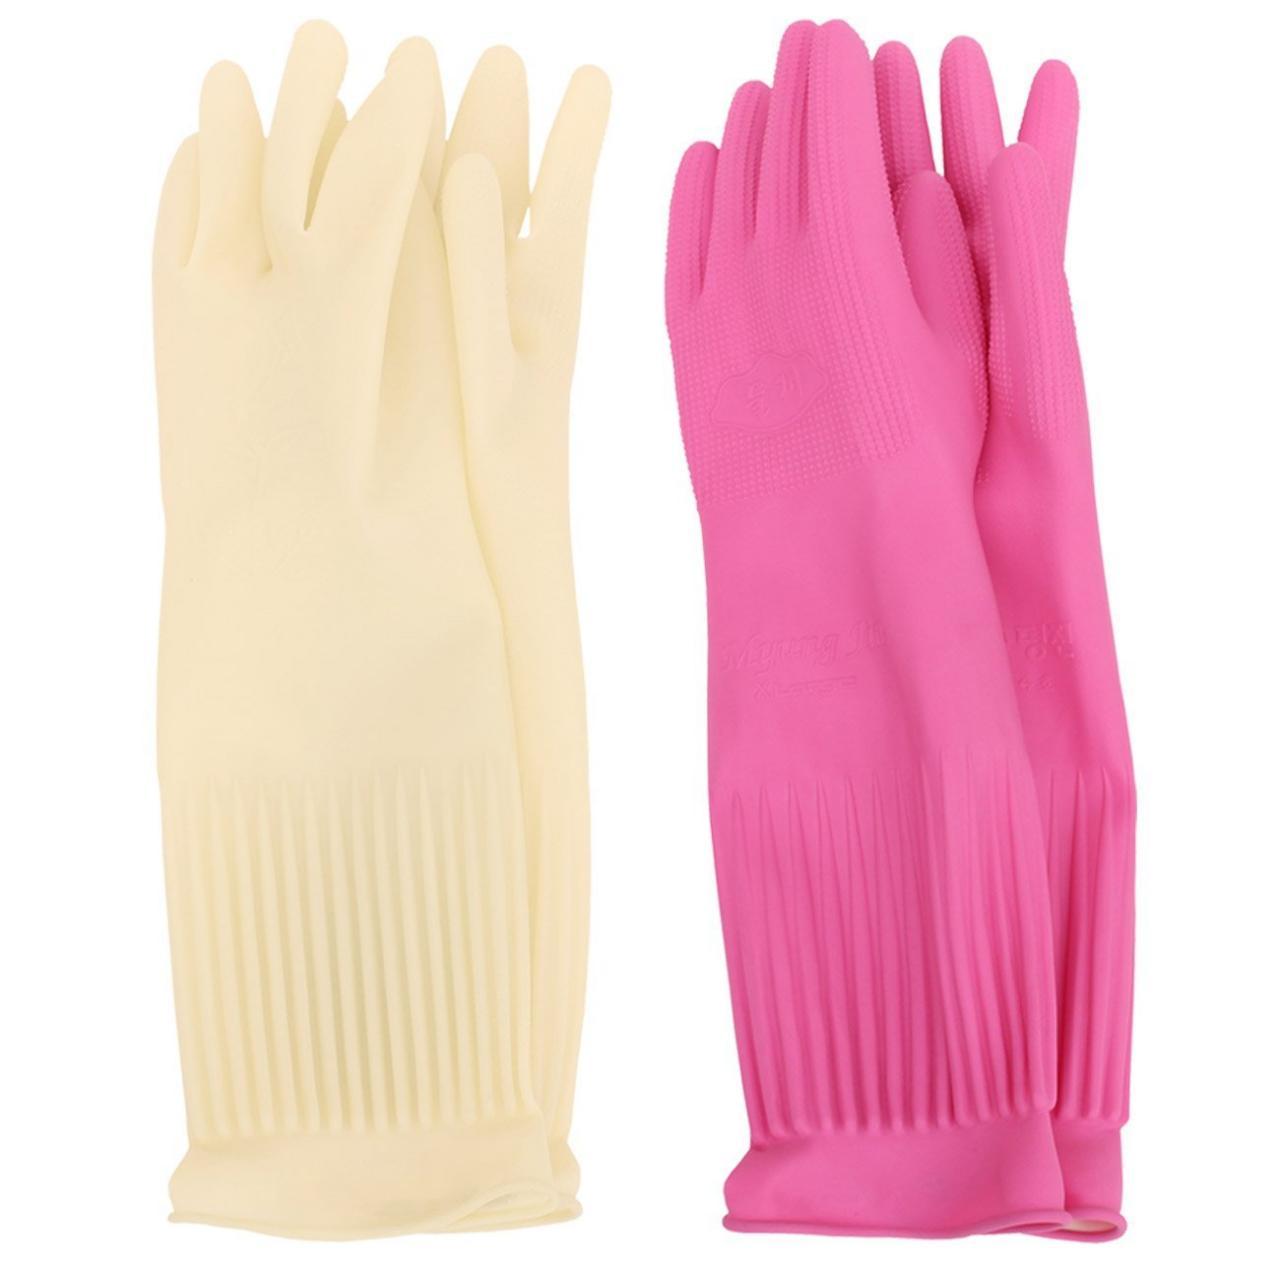 Amazon Gloves 10 คีย์สินค้า ปี 2017 - ไม่ดู ไม่ได้สำหรับนักขาย Amazon เข้ามาดูข้อมูลและสินค้ากลุ่มนี้ด่วน!